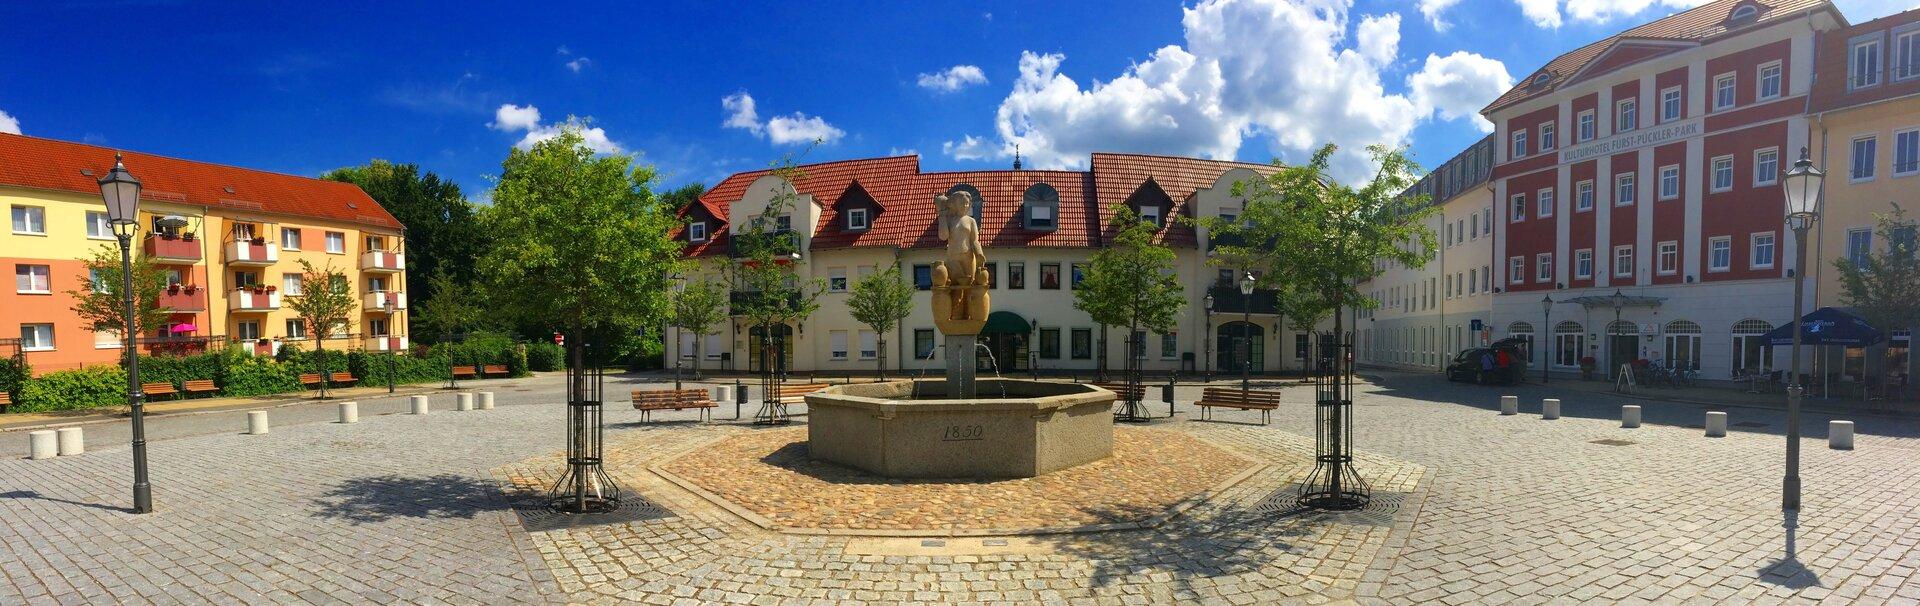 Bad_Muskau_Touristik_GmbH_Marktplatz